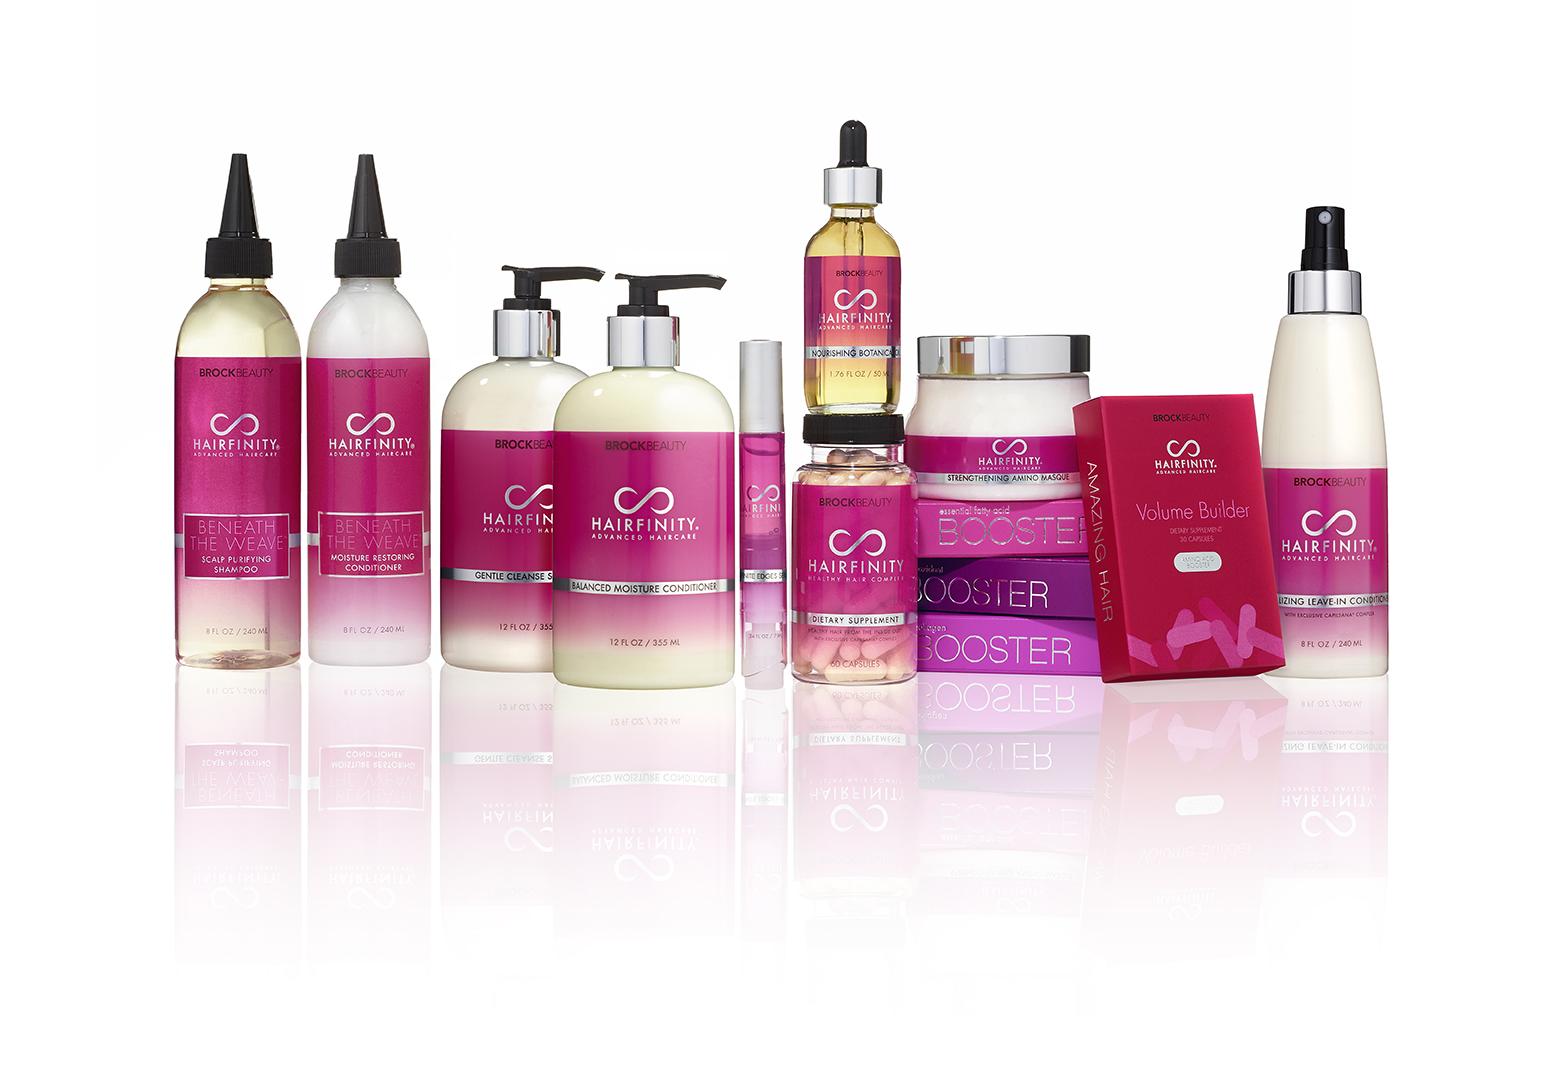 Hairfinity Hair Products